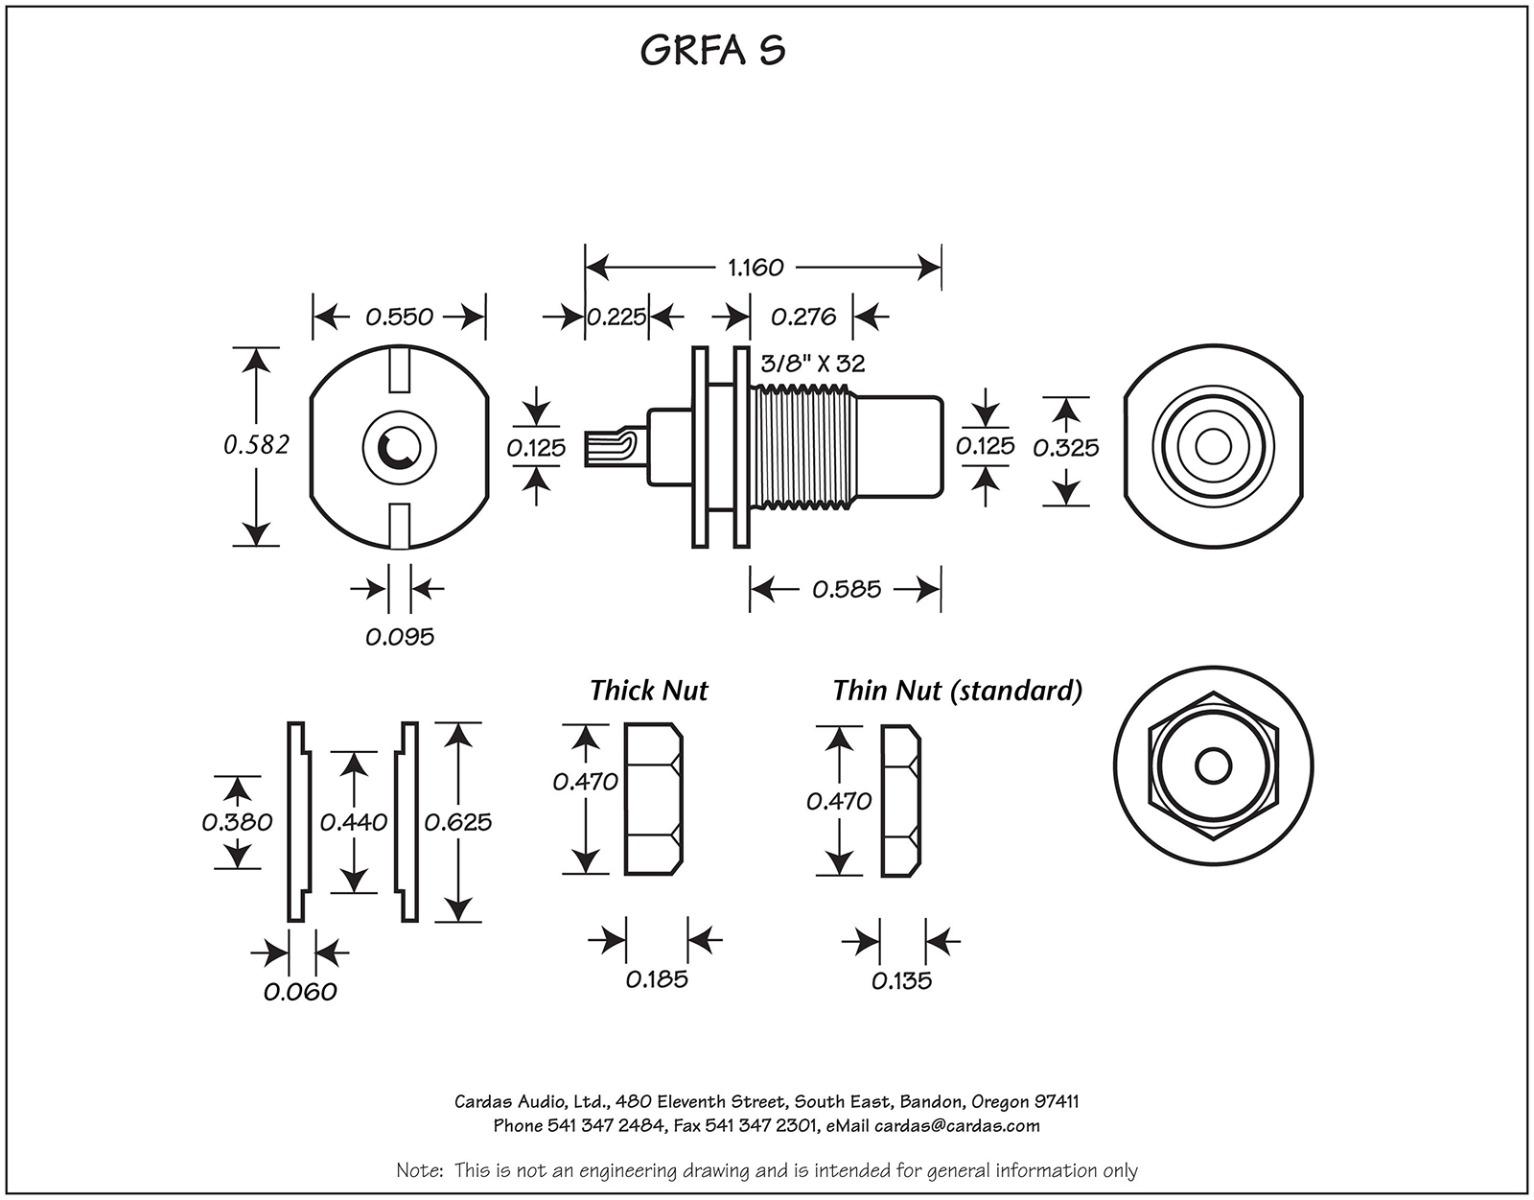 Cardas GRFA Short RCA mount dimensions